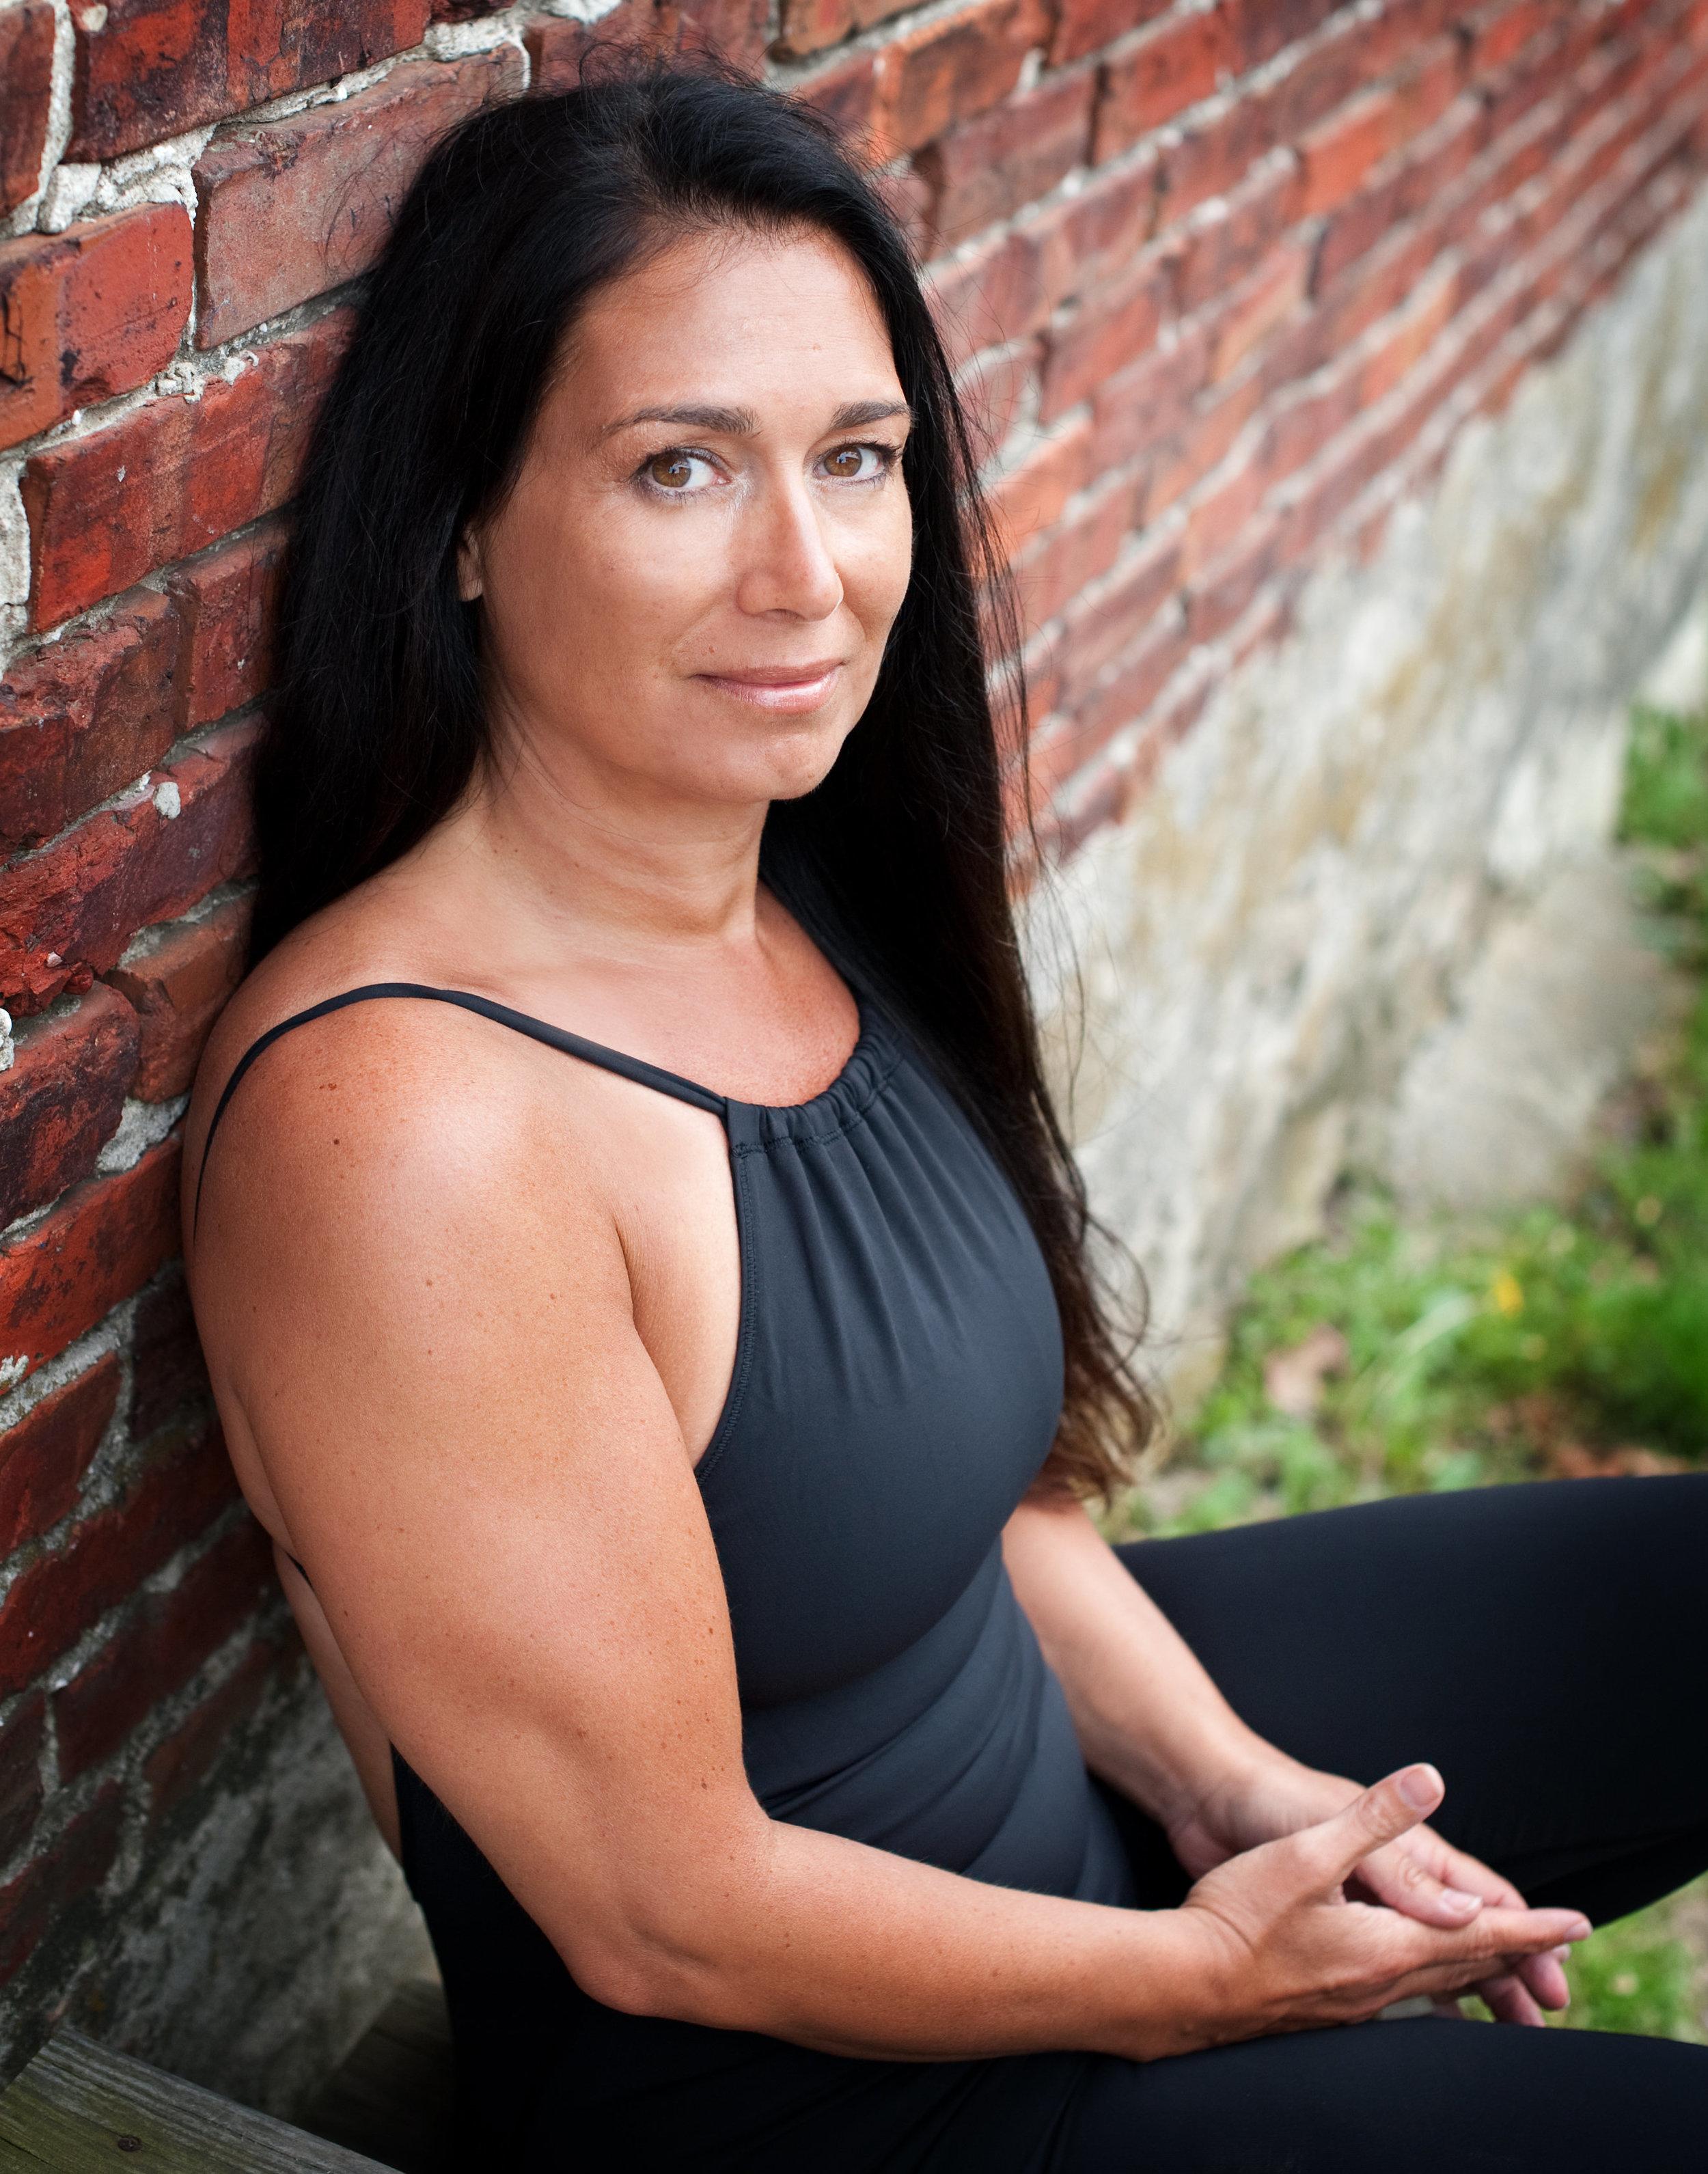 9:20am to 10:20am - Tribal Shakti Flow with Wanda Gilhool, SHINE Power Yoga